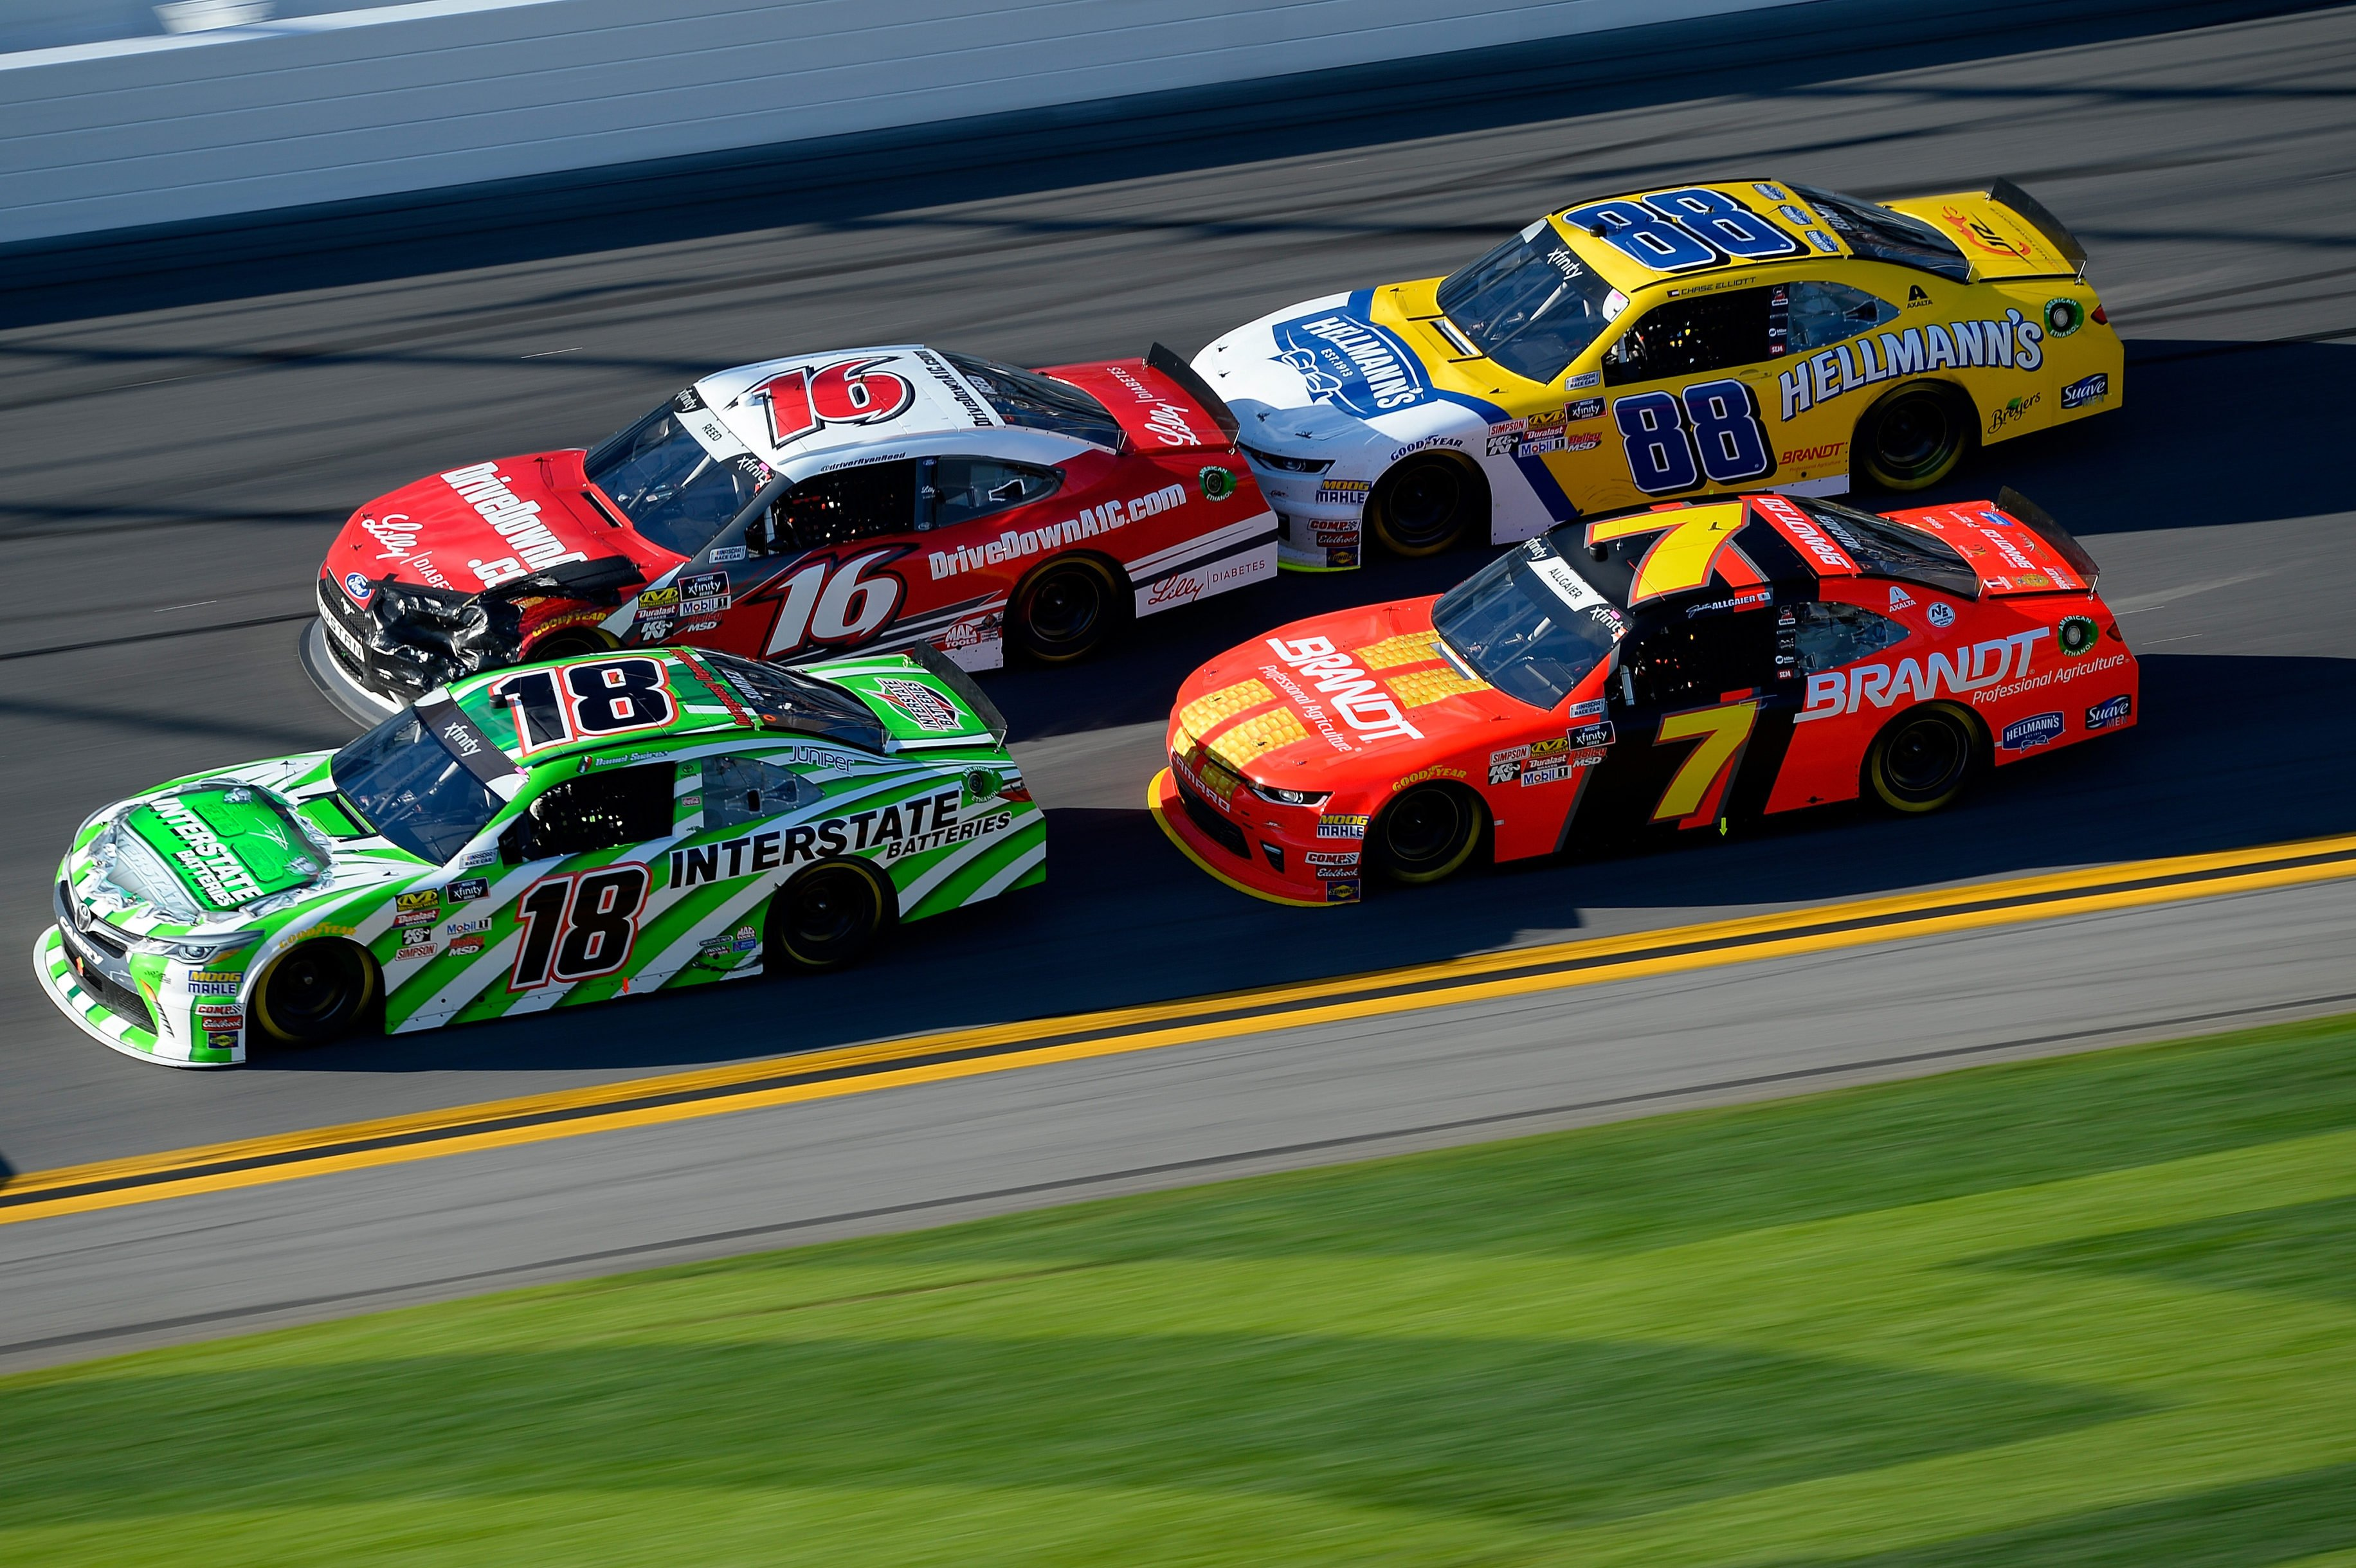 Daniel Suarez, Matt Tifft, Chase Elliott and Justin Allgaier at Daytona